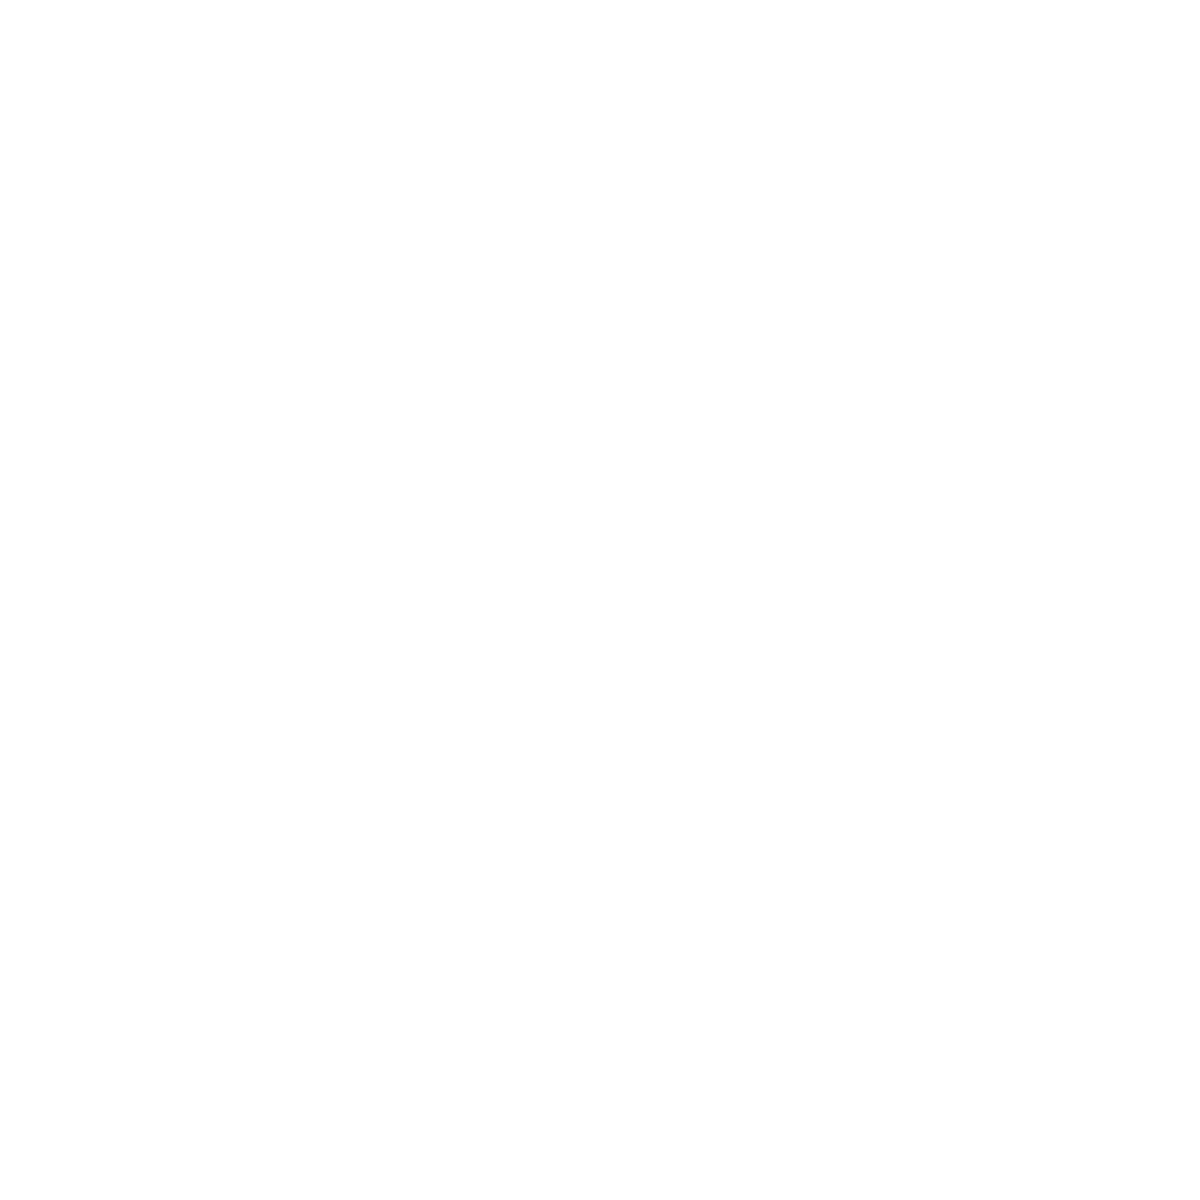 TNT_White_00000.png